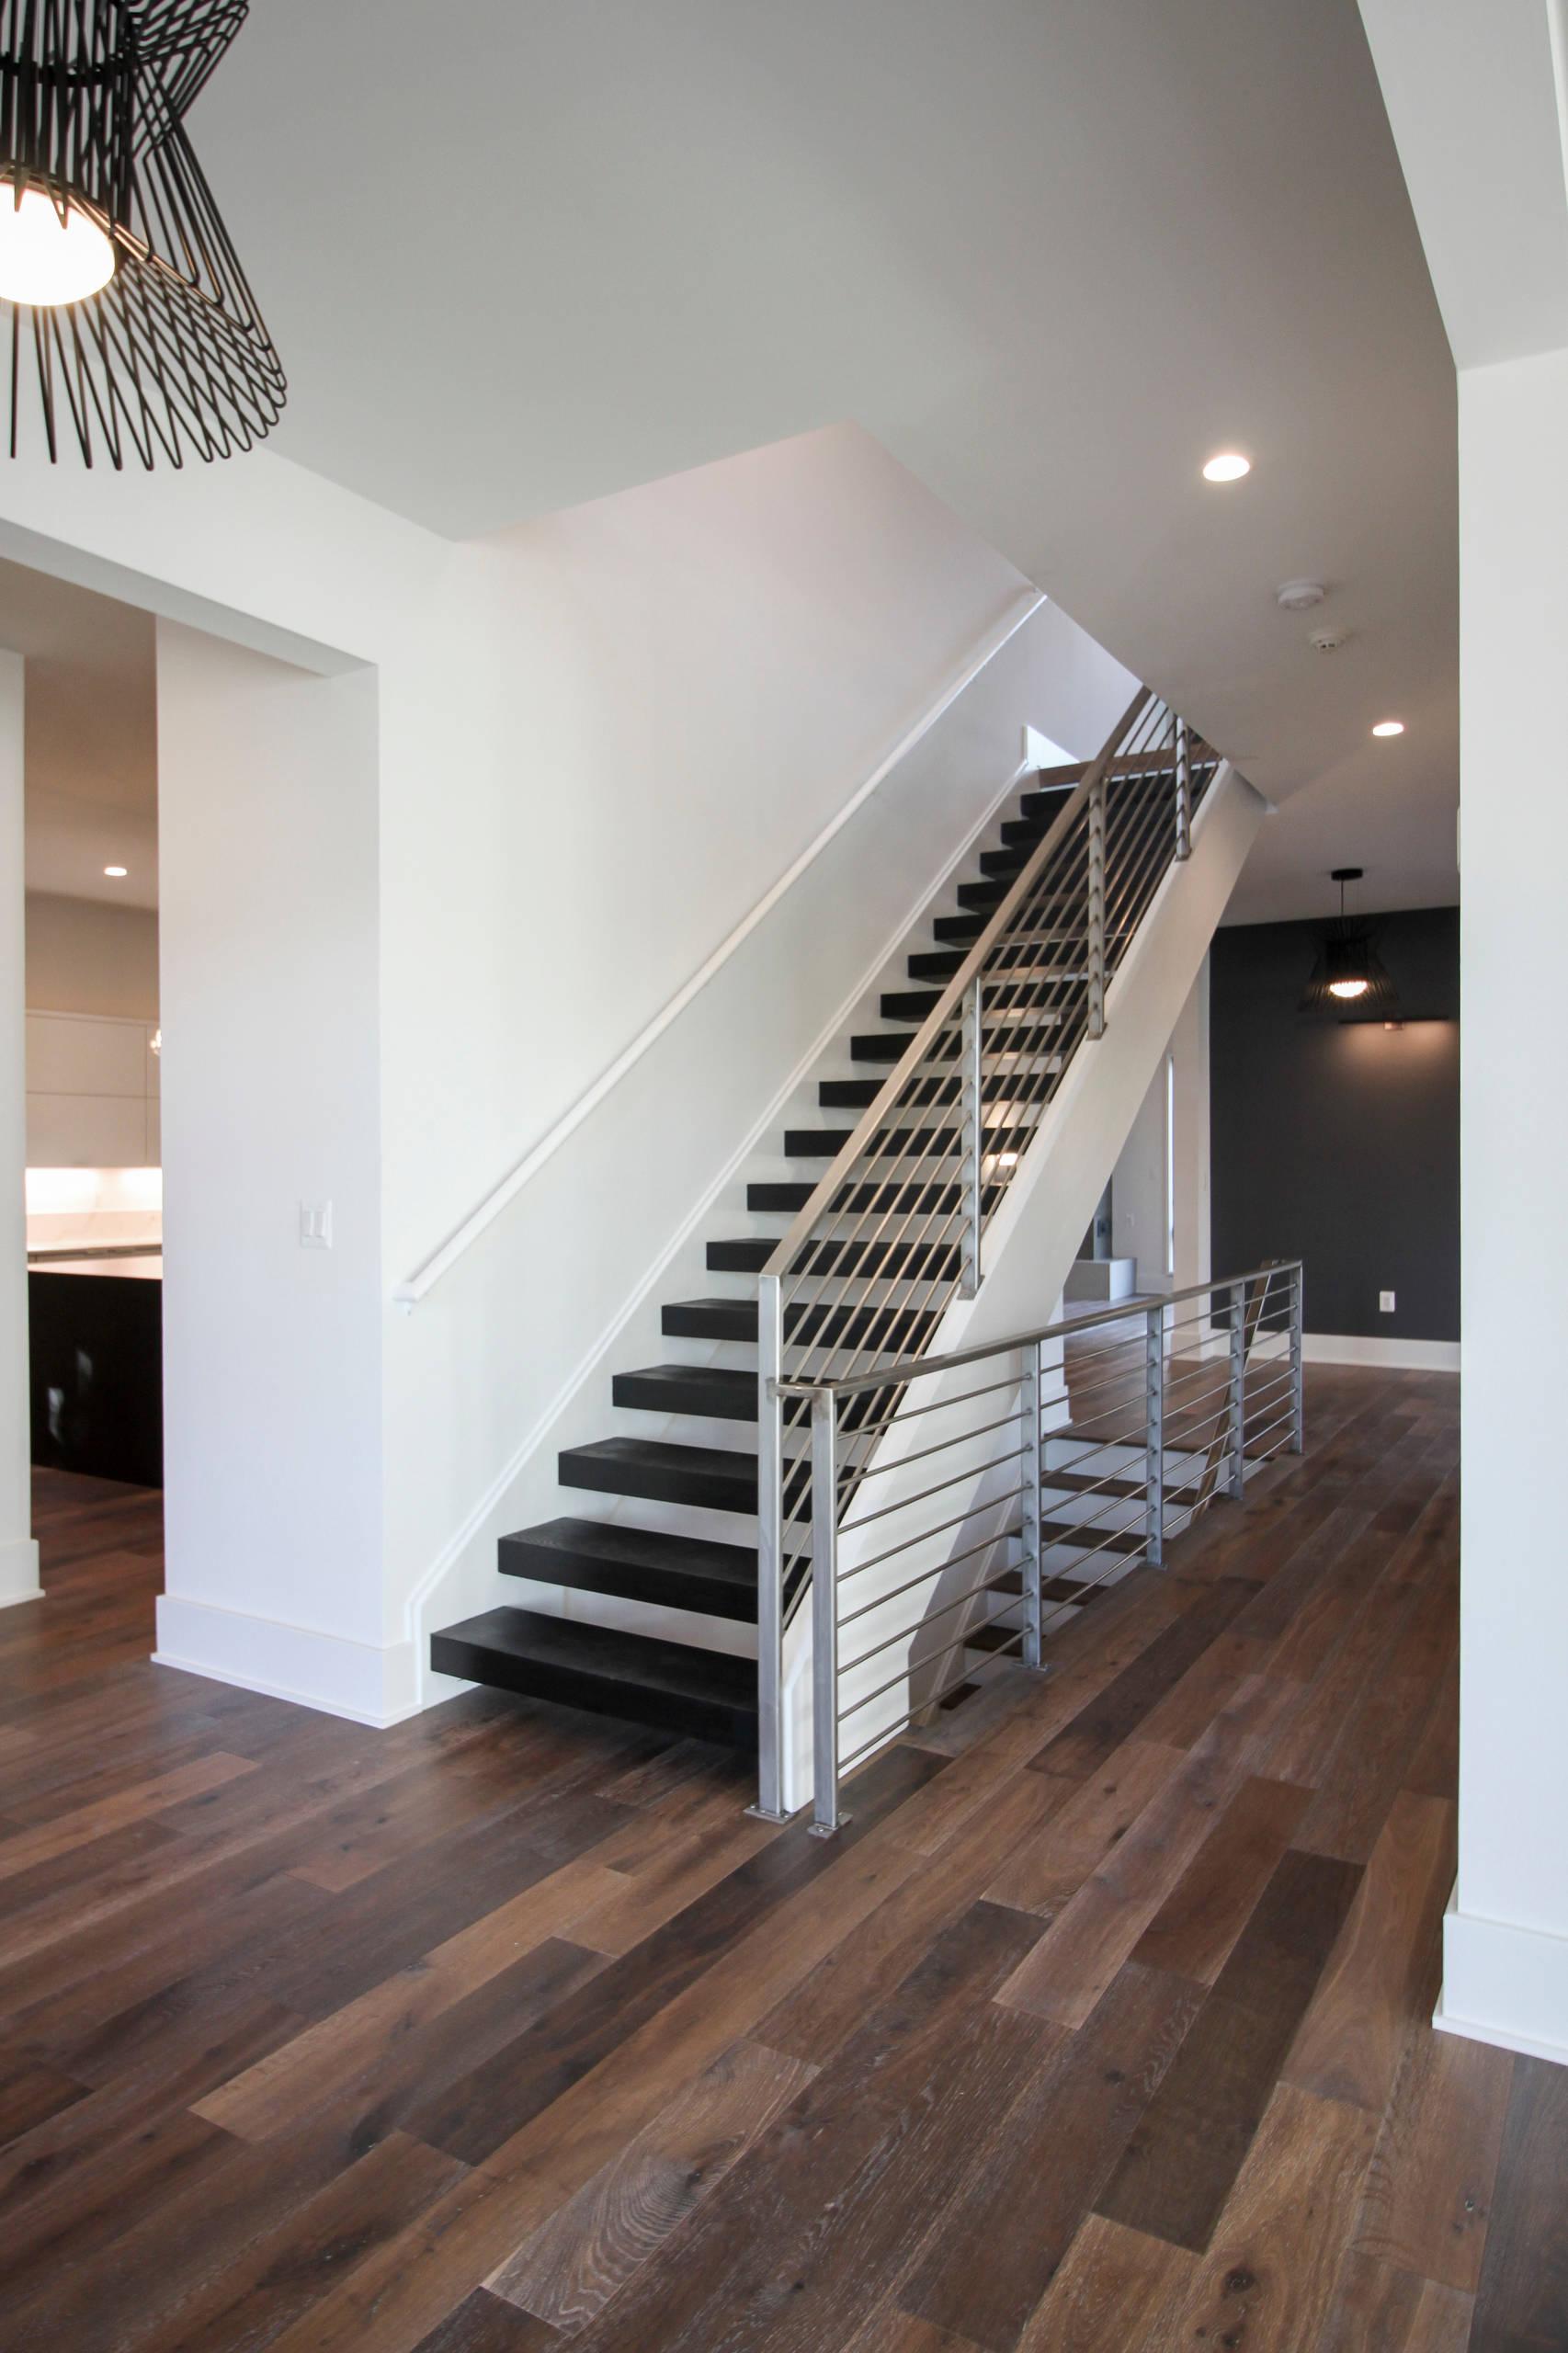 59_Dramatic Staircase/Focal Point in Ultramodern Home, Arlington VA 22207